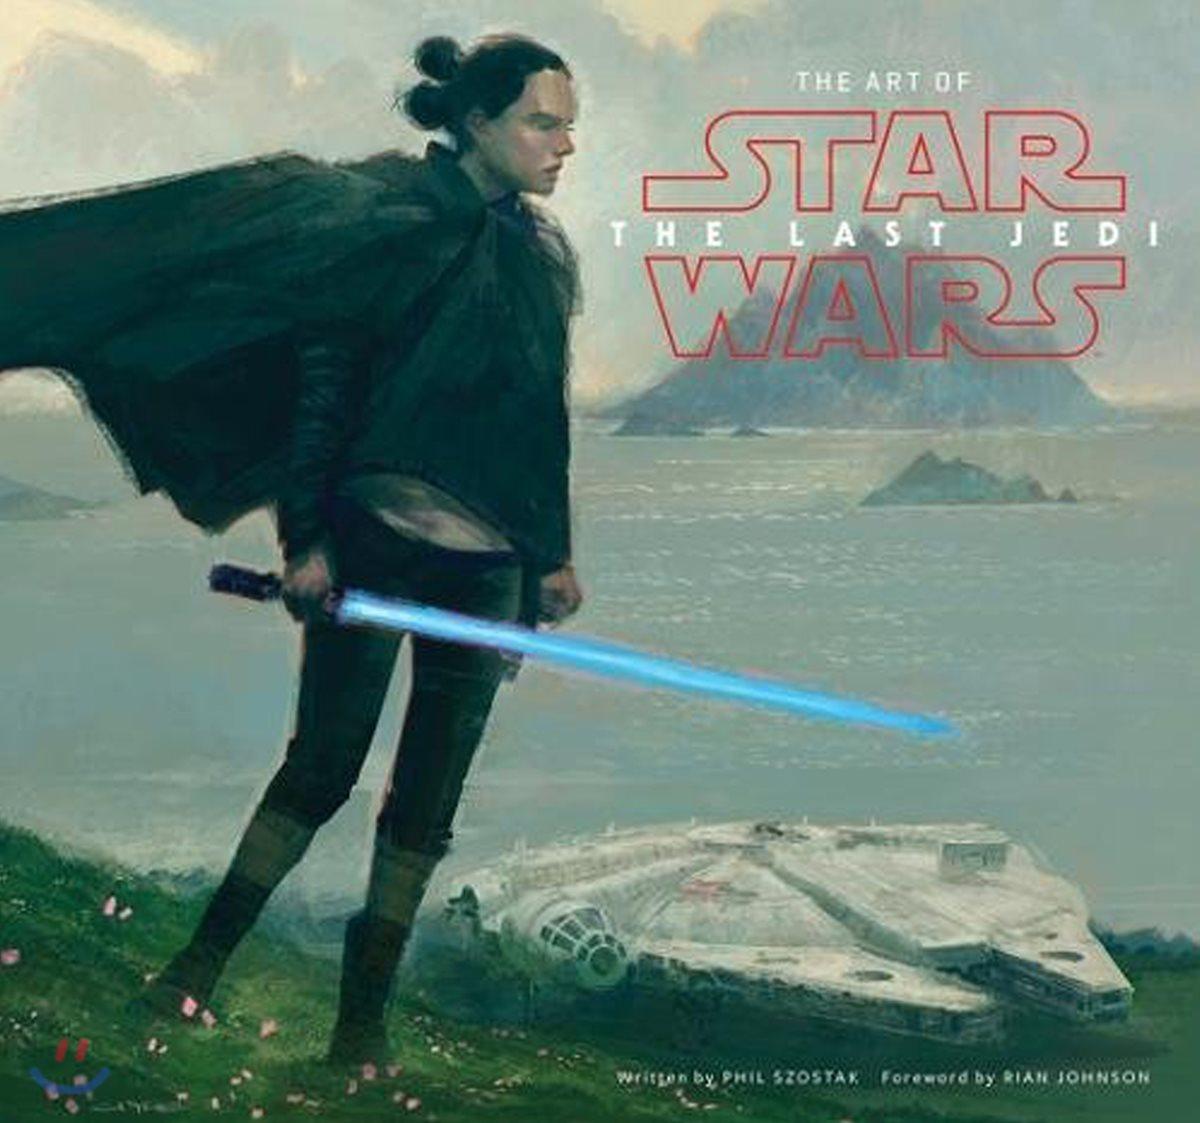 The Art of Star Wars : The Last Jedi : 영화 '스타워즈 : 더 라스트 제다이' 공식 컨셉 아트북